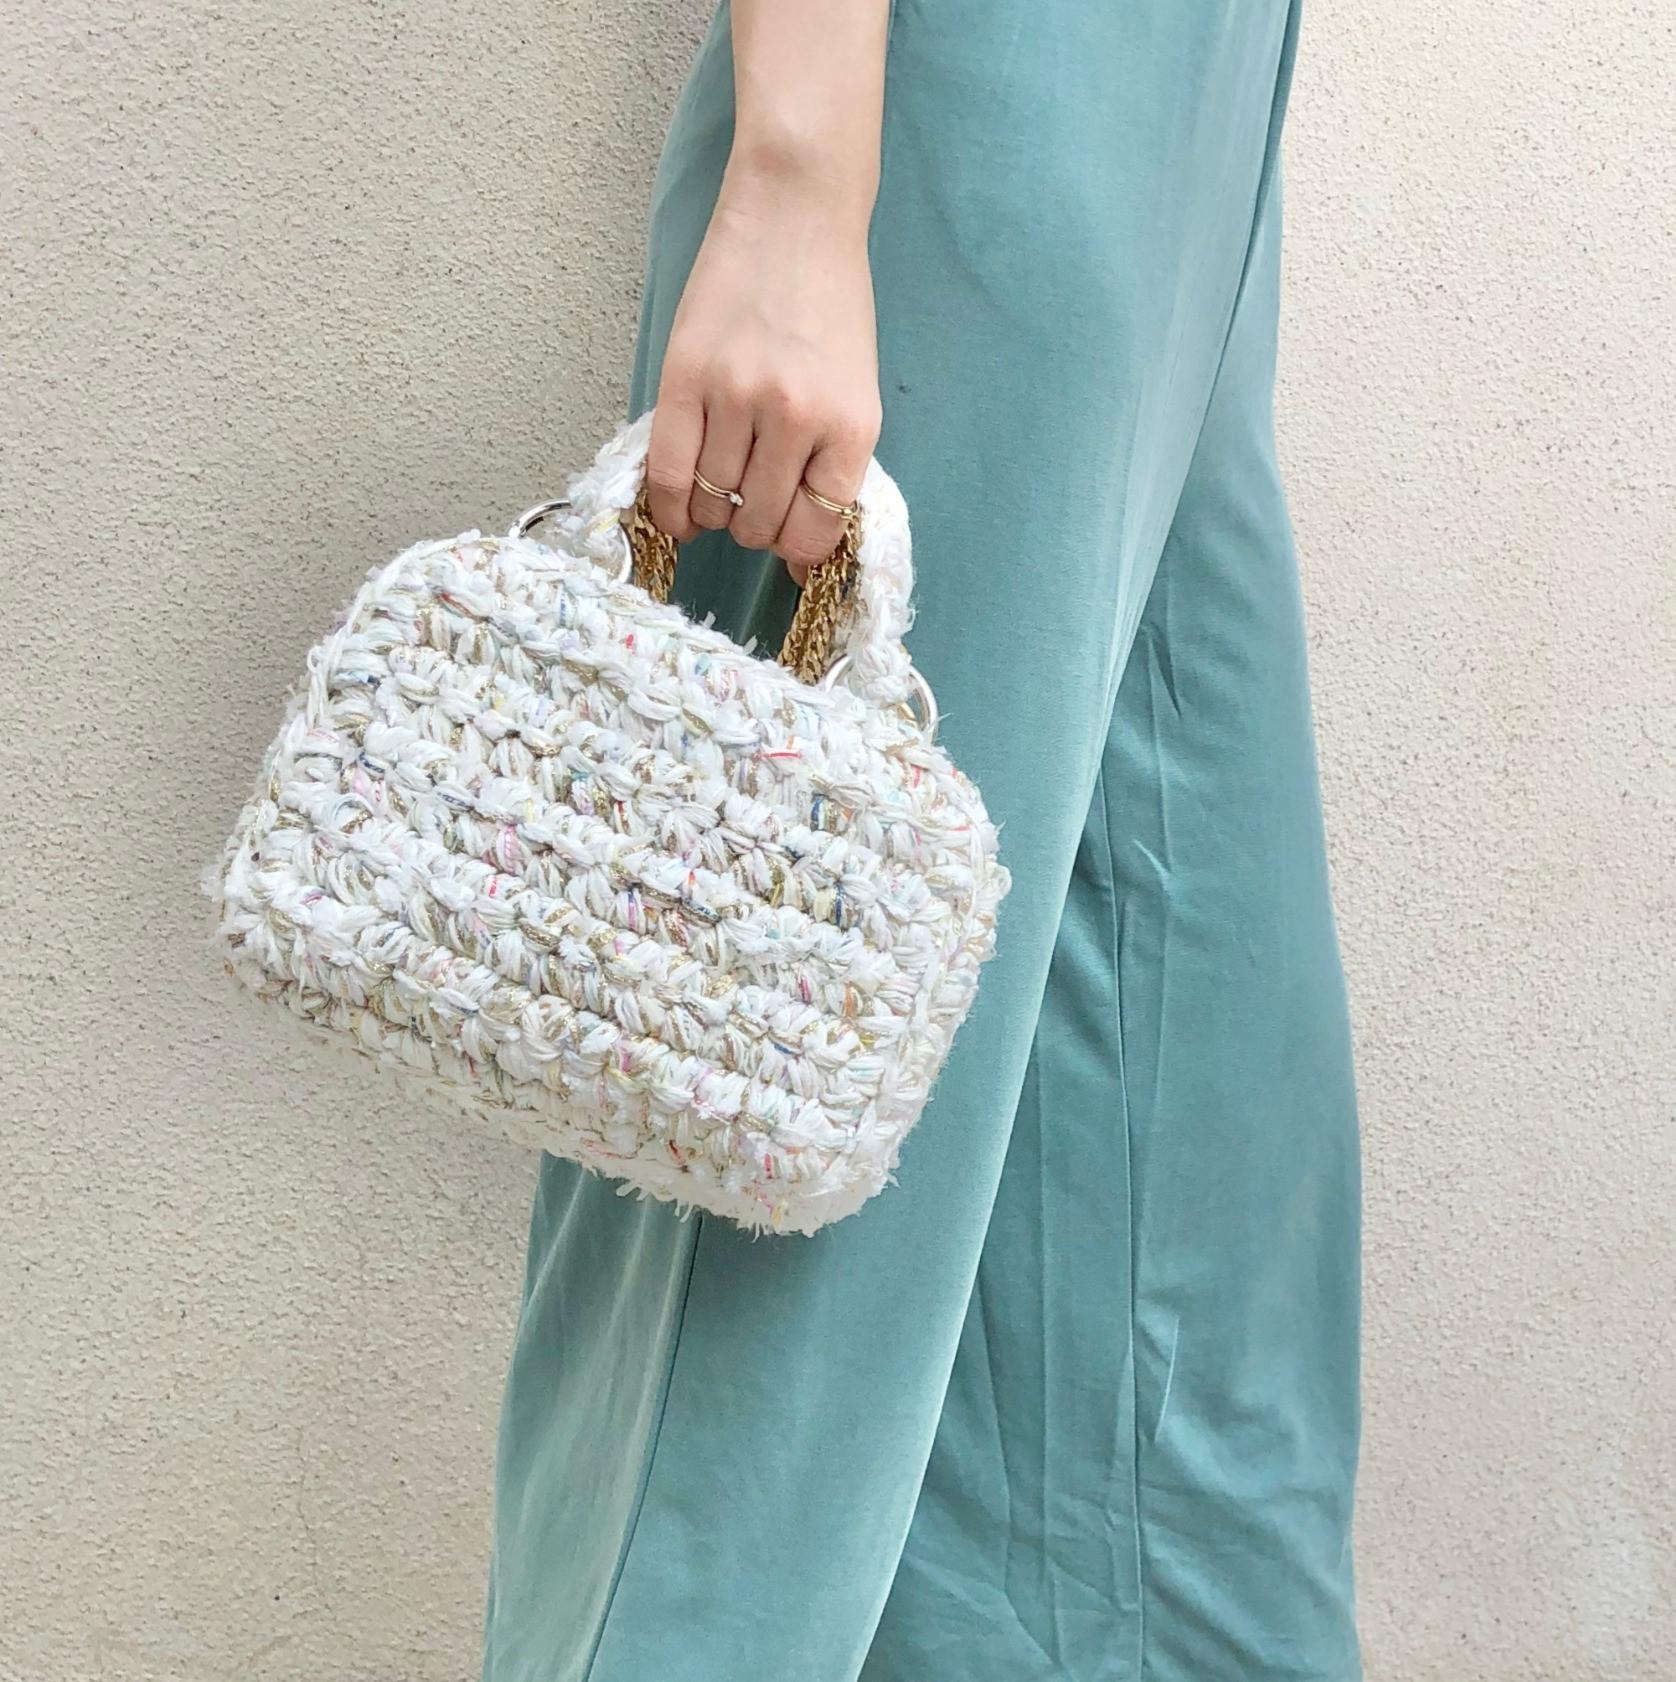 Beginner-Crochet Fancy Vanity Bag